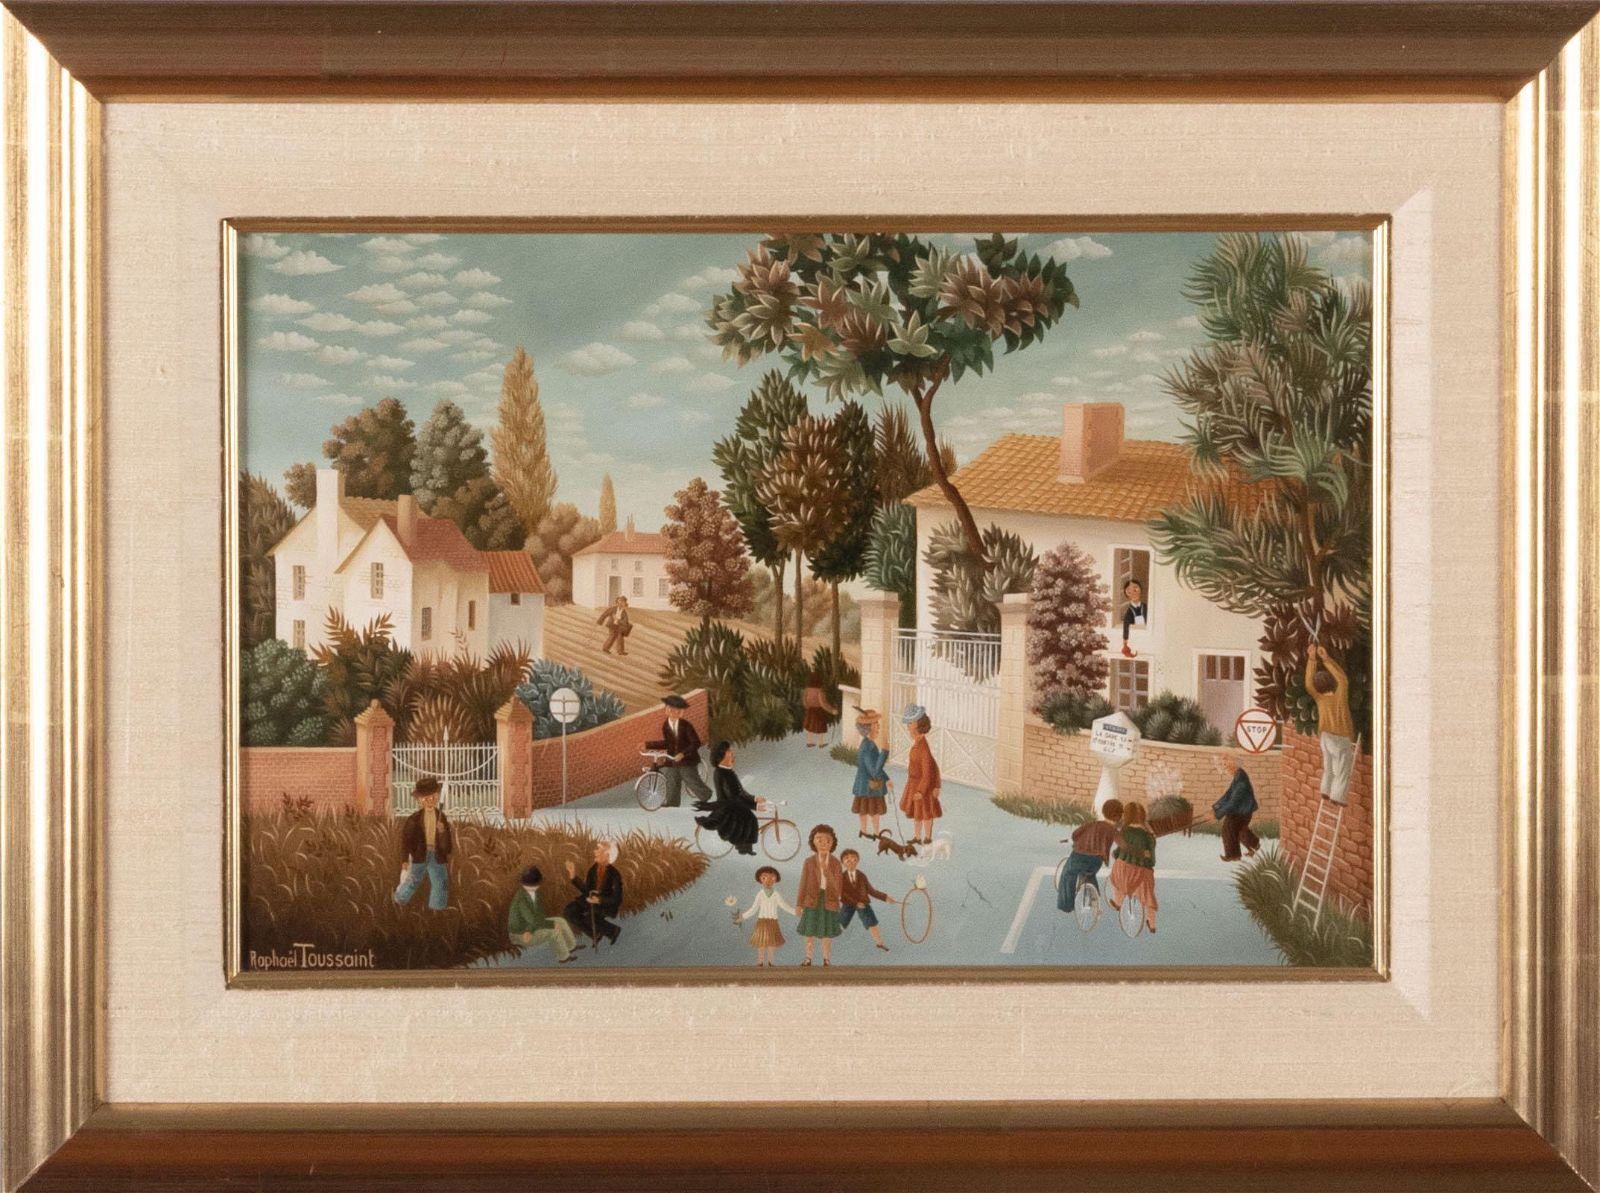 Raphael Toussaint, French (b. 1937), Village Scene with